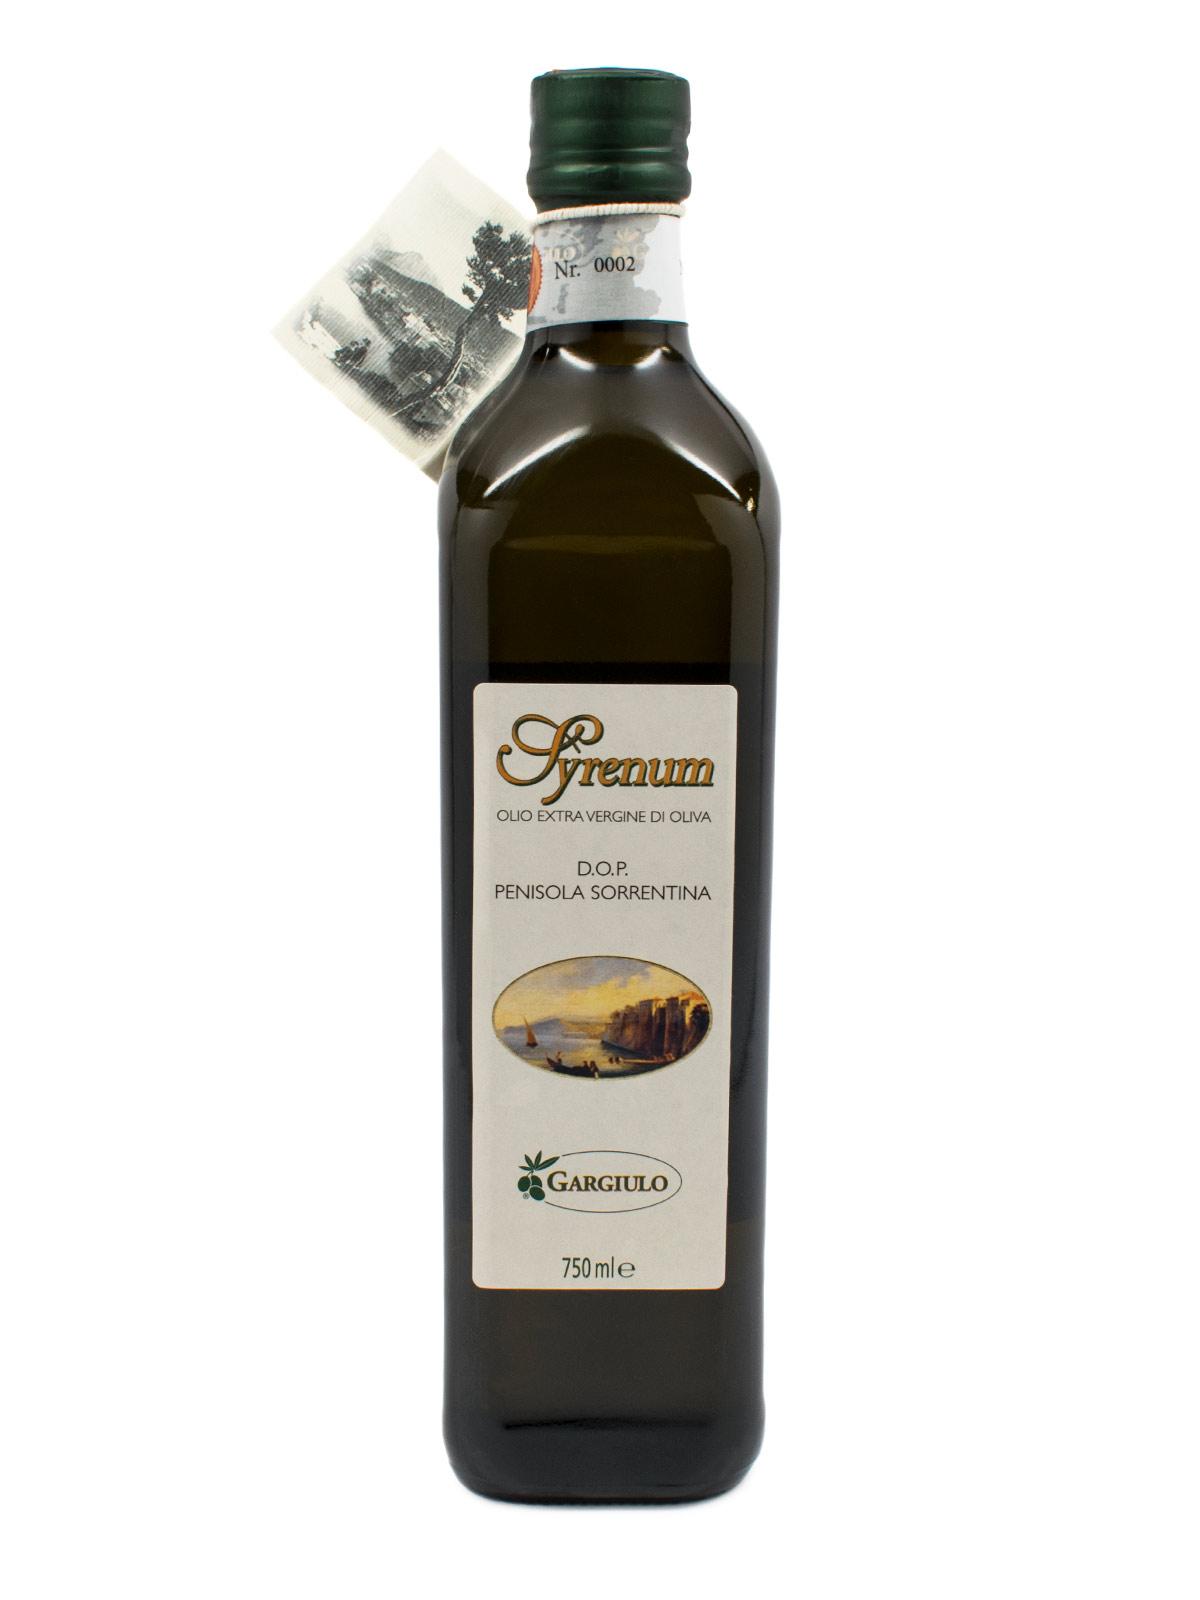 Syrenum Extra Virgin Olive Oil D.O.P. - Oils & Vinegars - Buon'Italia